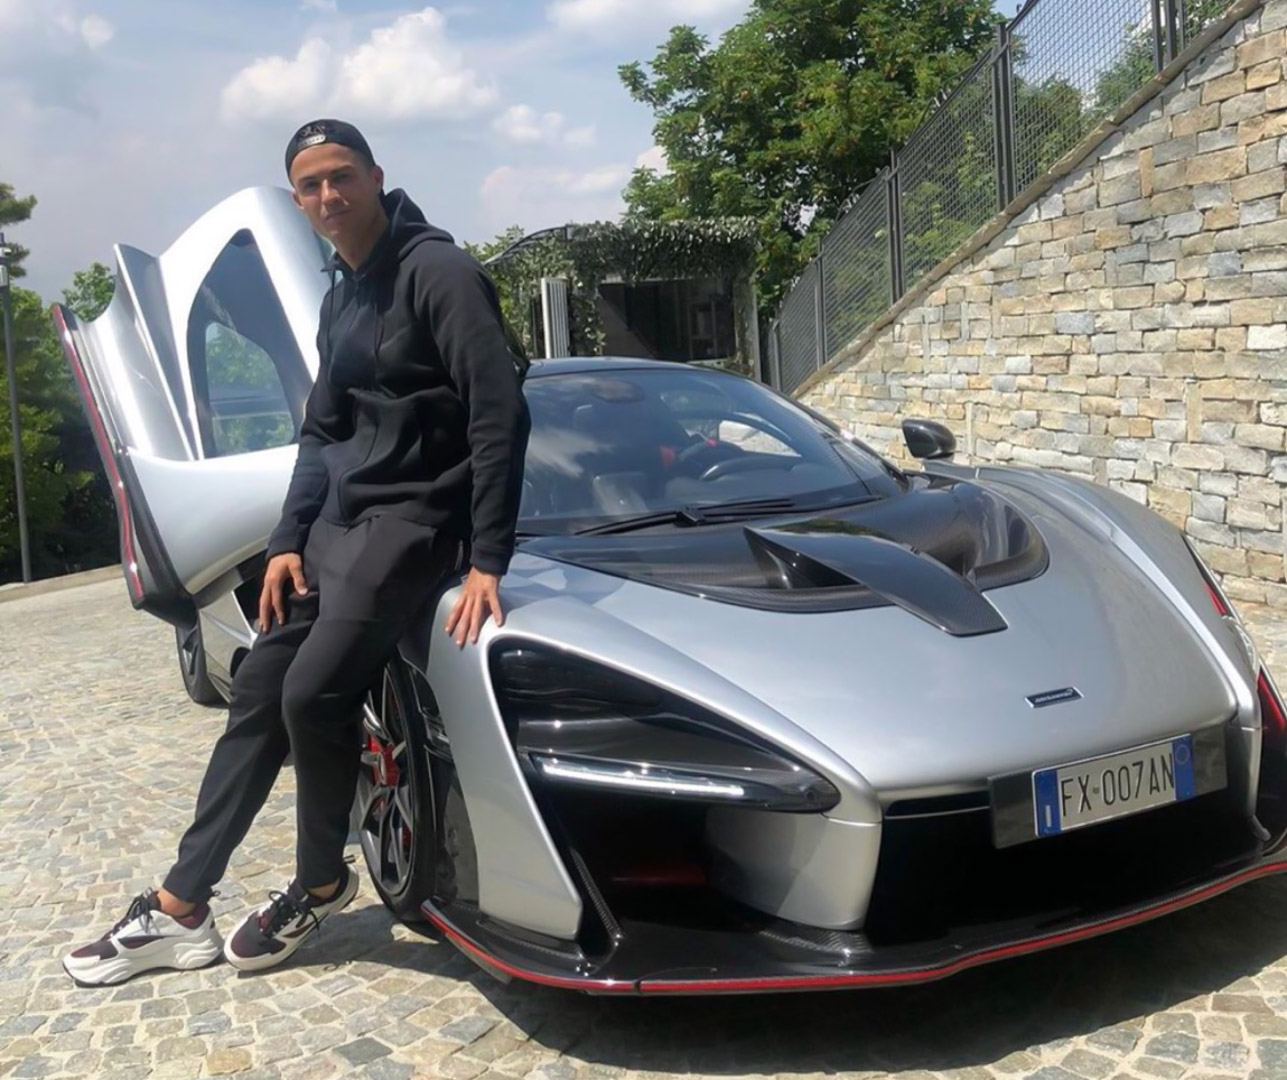 CP-Bộ sưu tập xe của Cristiano Ronaldo (1).jpg